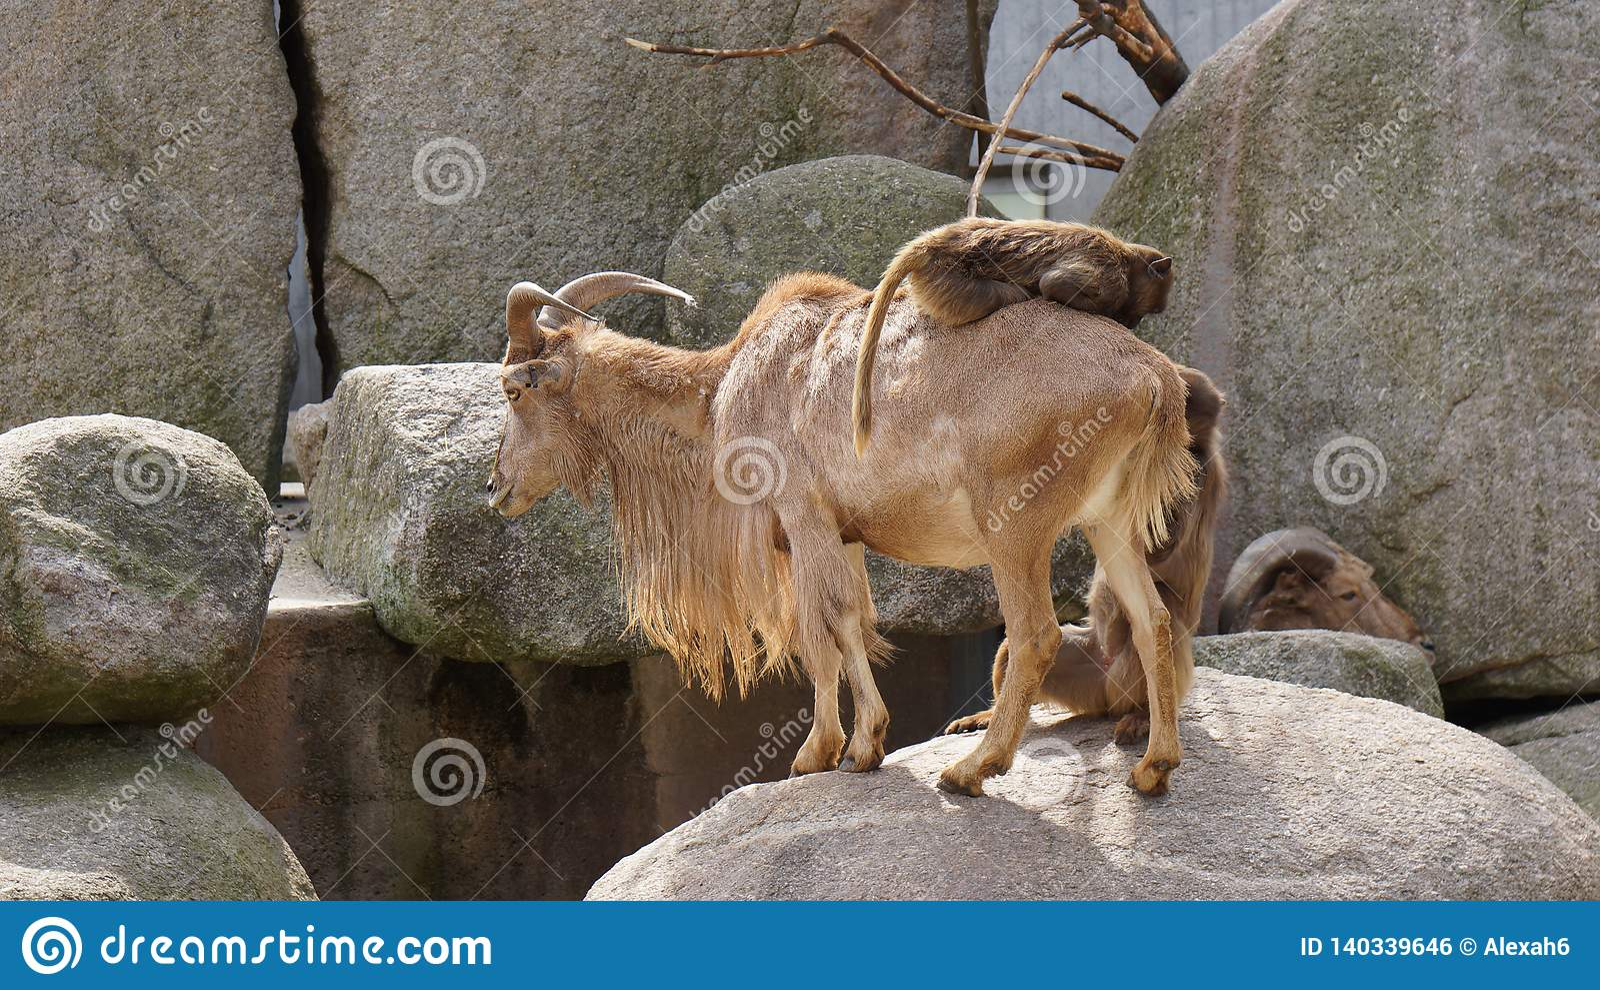 Monkey riding on goat hill scenery